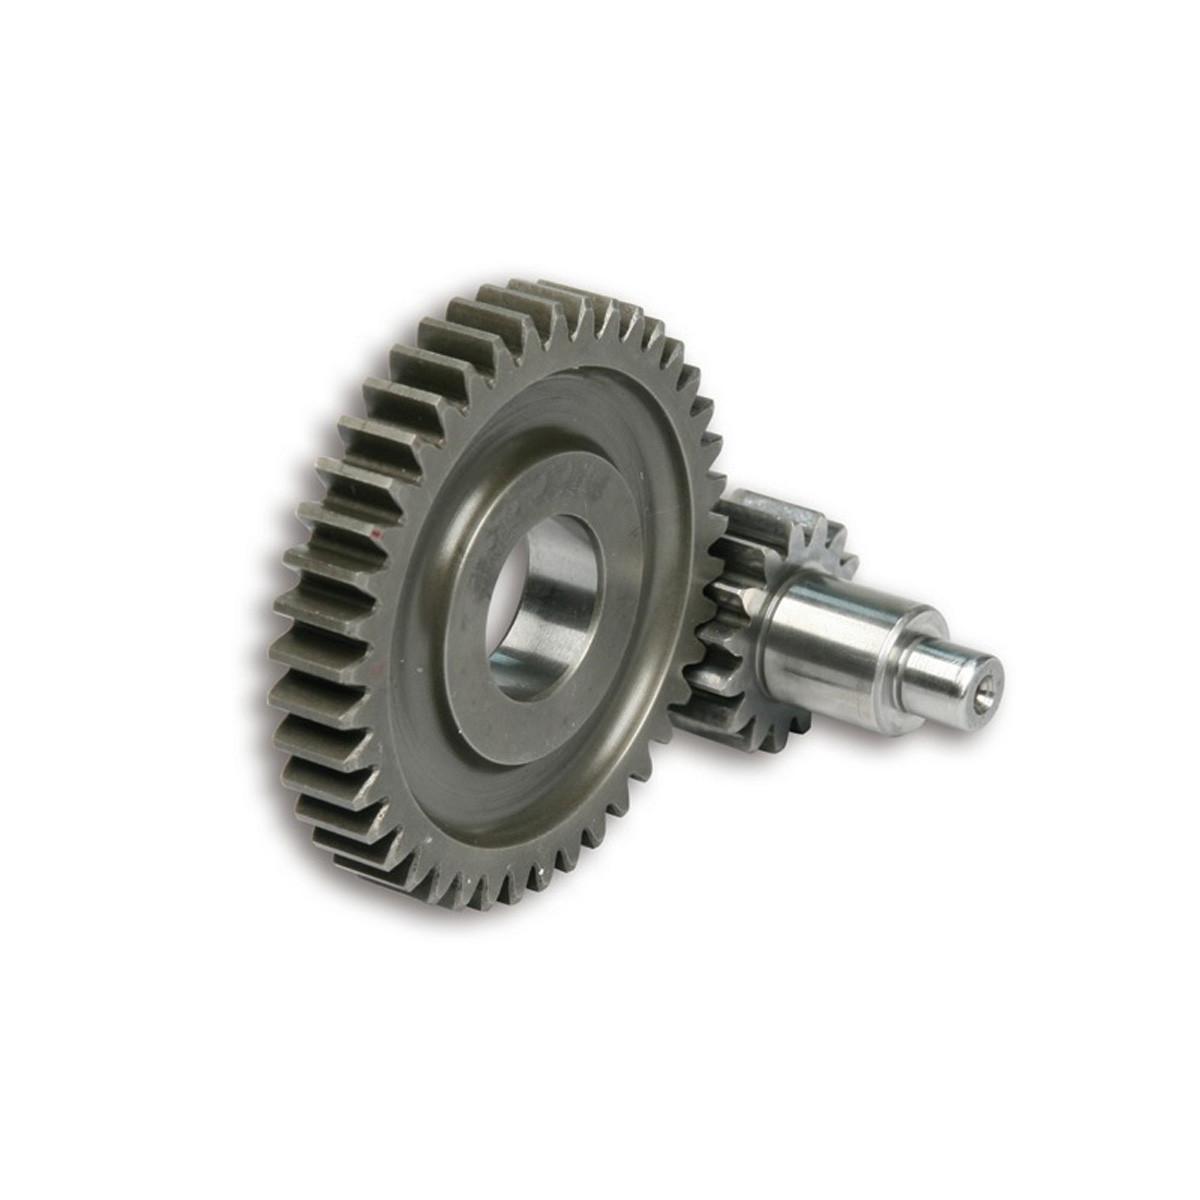 Kit Transmission Secondaire MBK Nitro - Ovetto 15/42 Dents - MALOSSI MHR